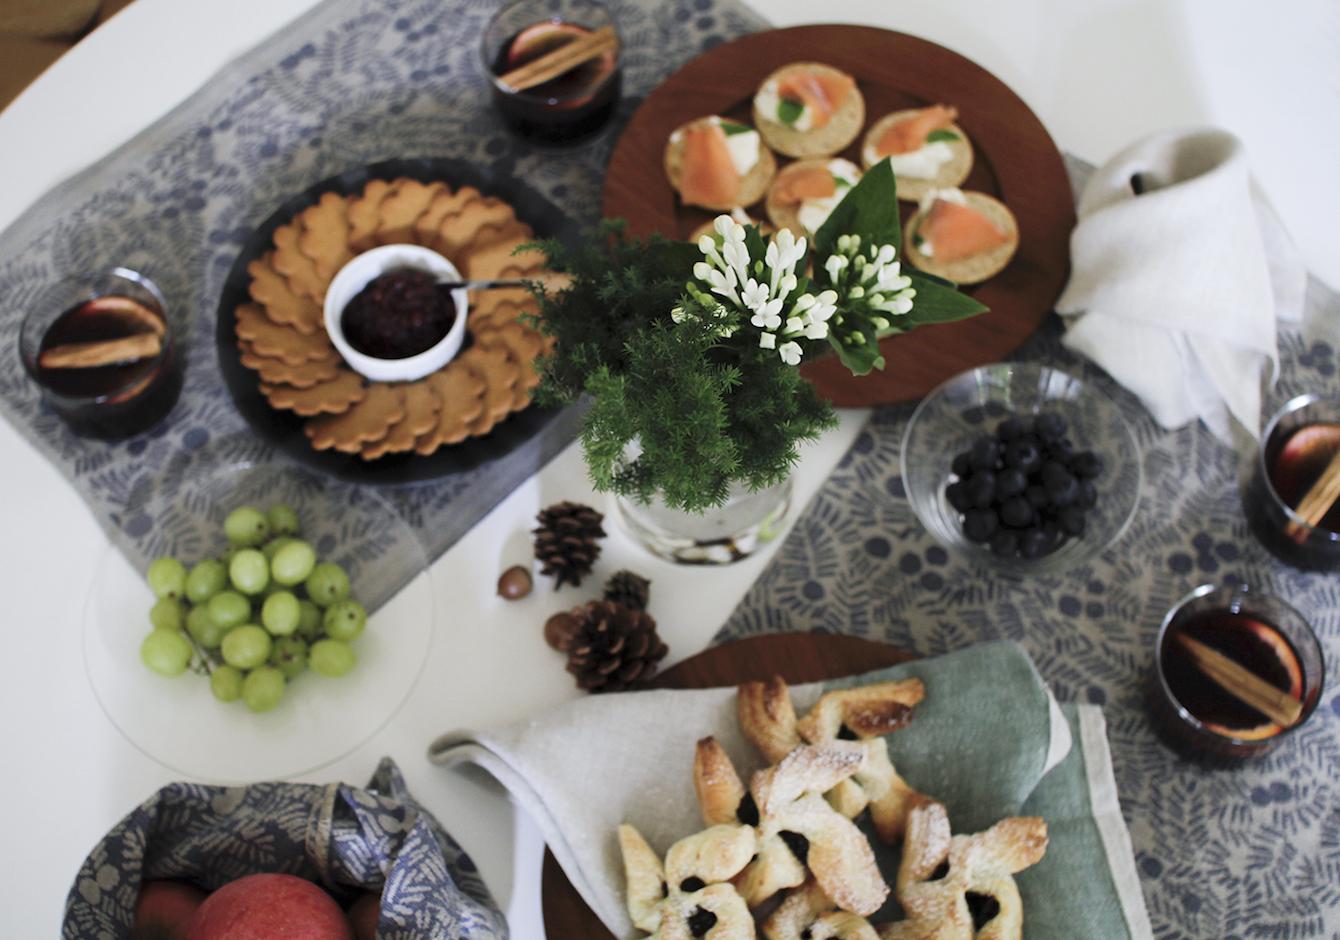 PIKKUJOULU! enjoy a casual gatheringのイメージ画像